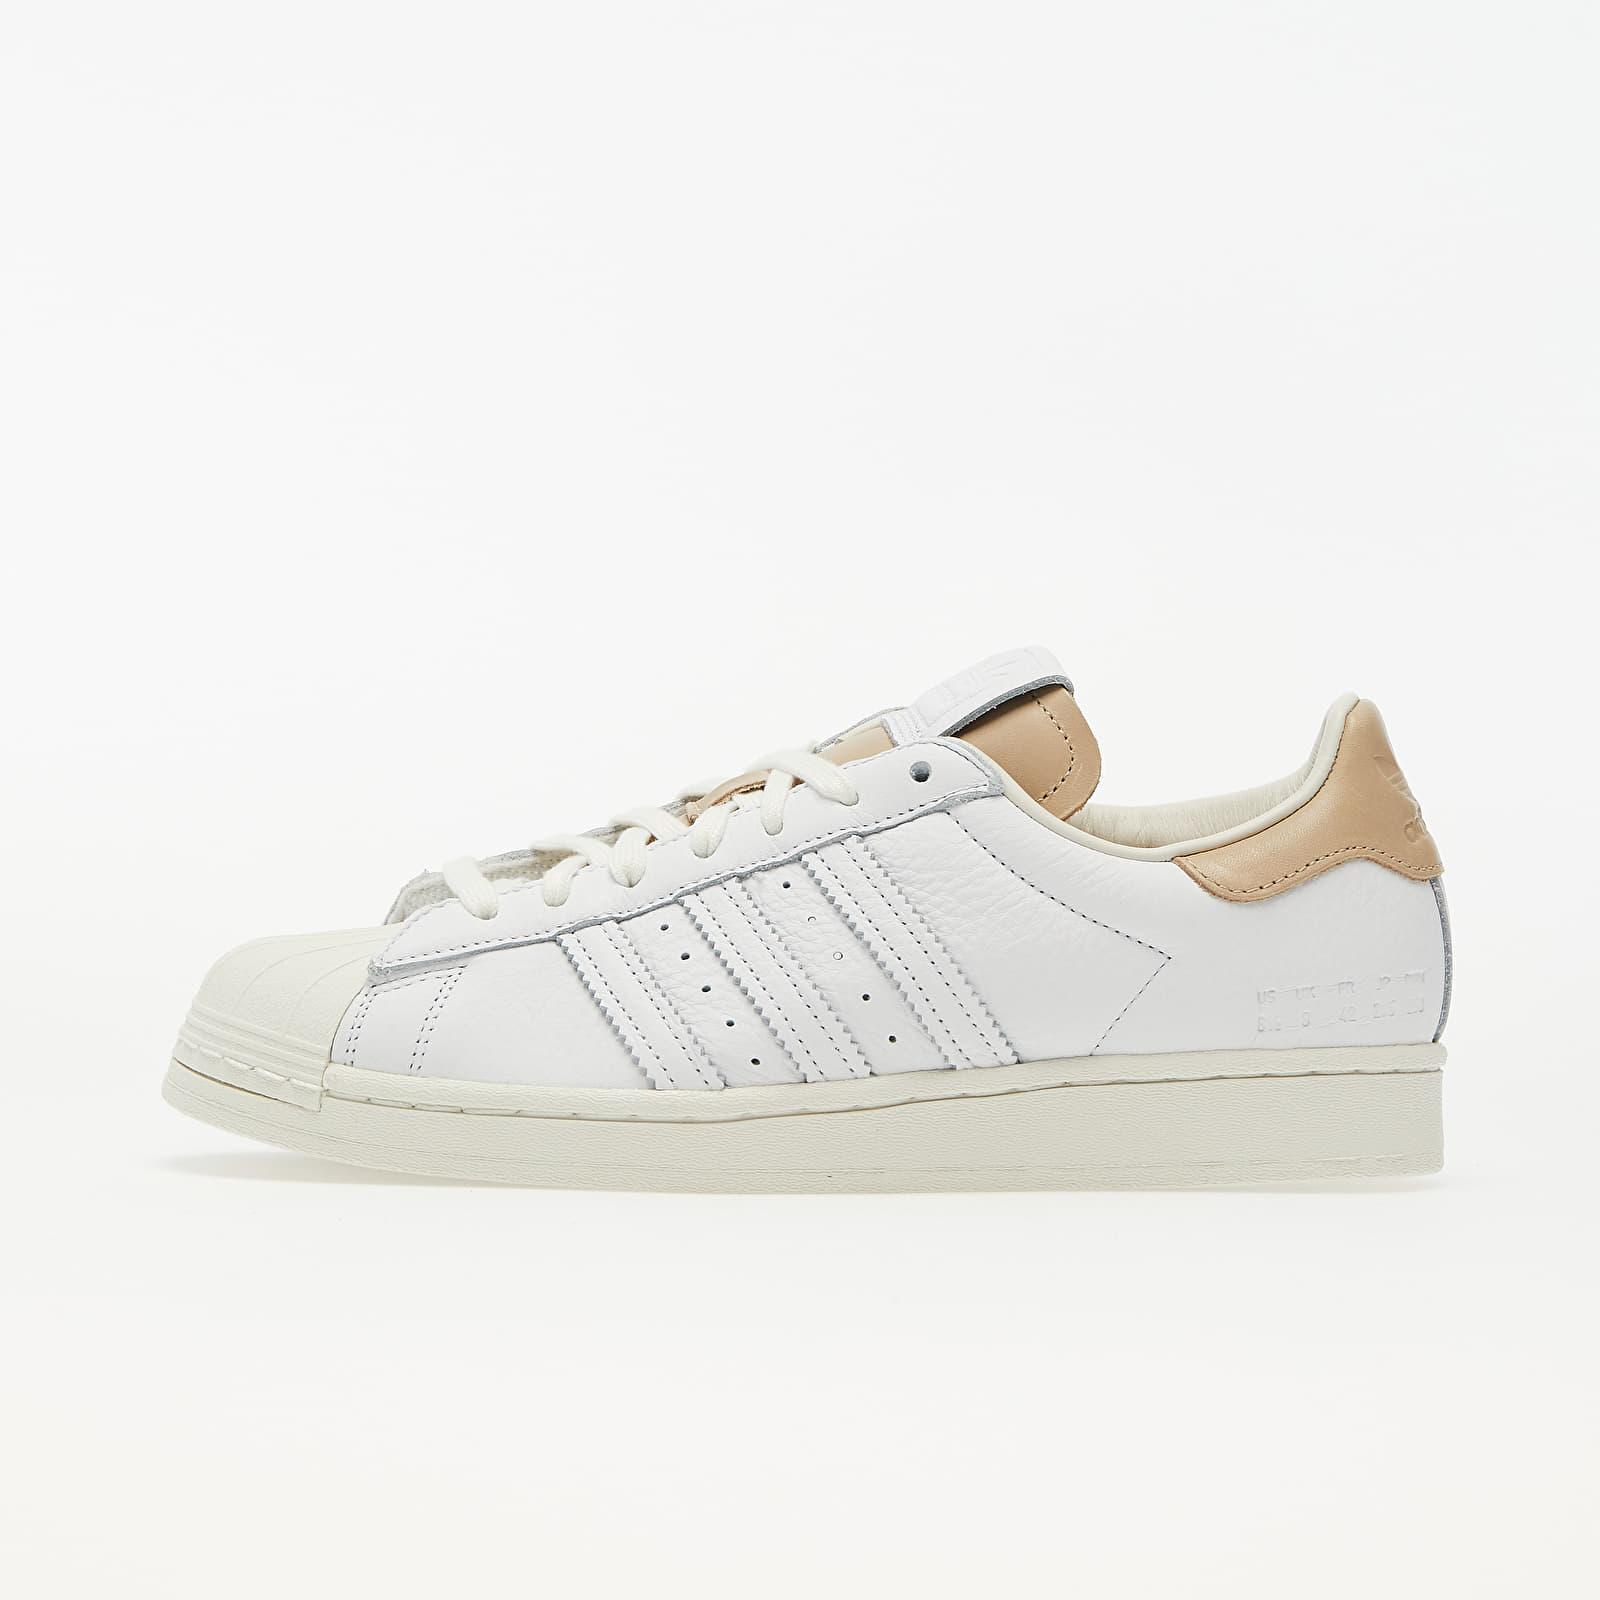 adidas Superstar Ftw White/ Ftw White/ Off White EUR 44